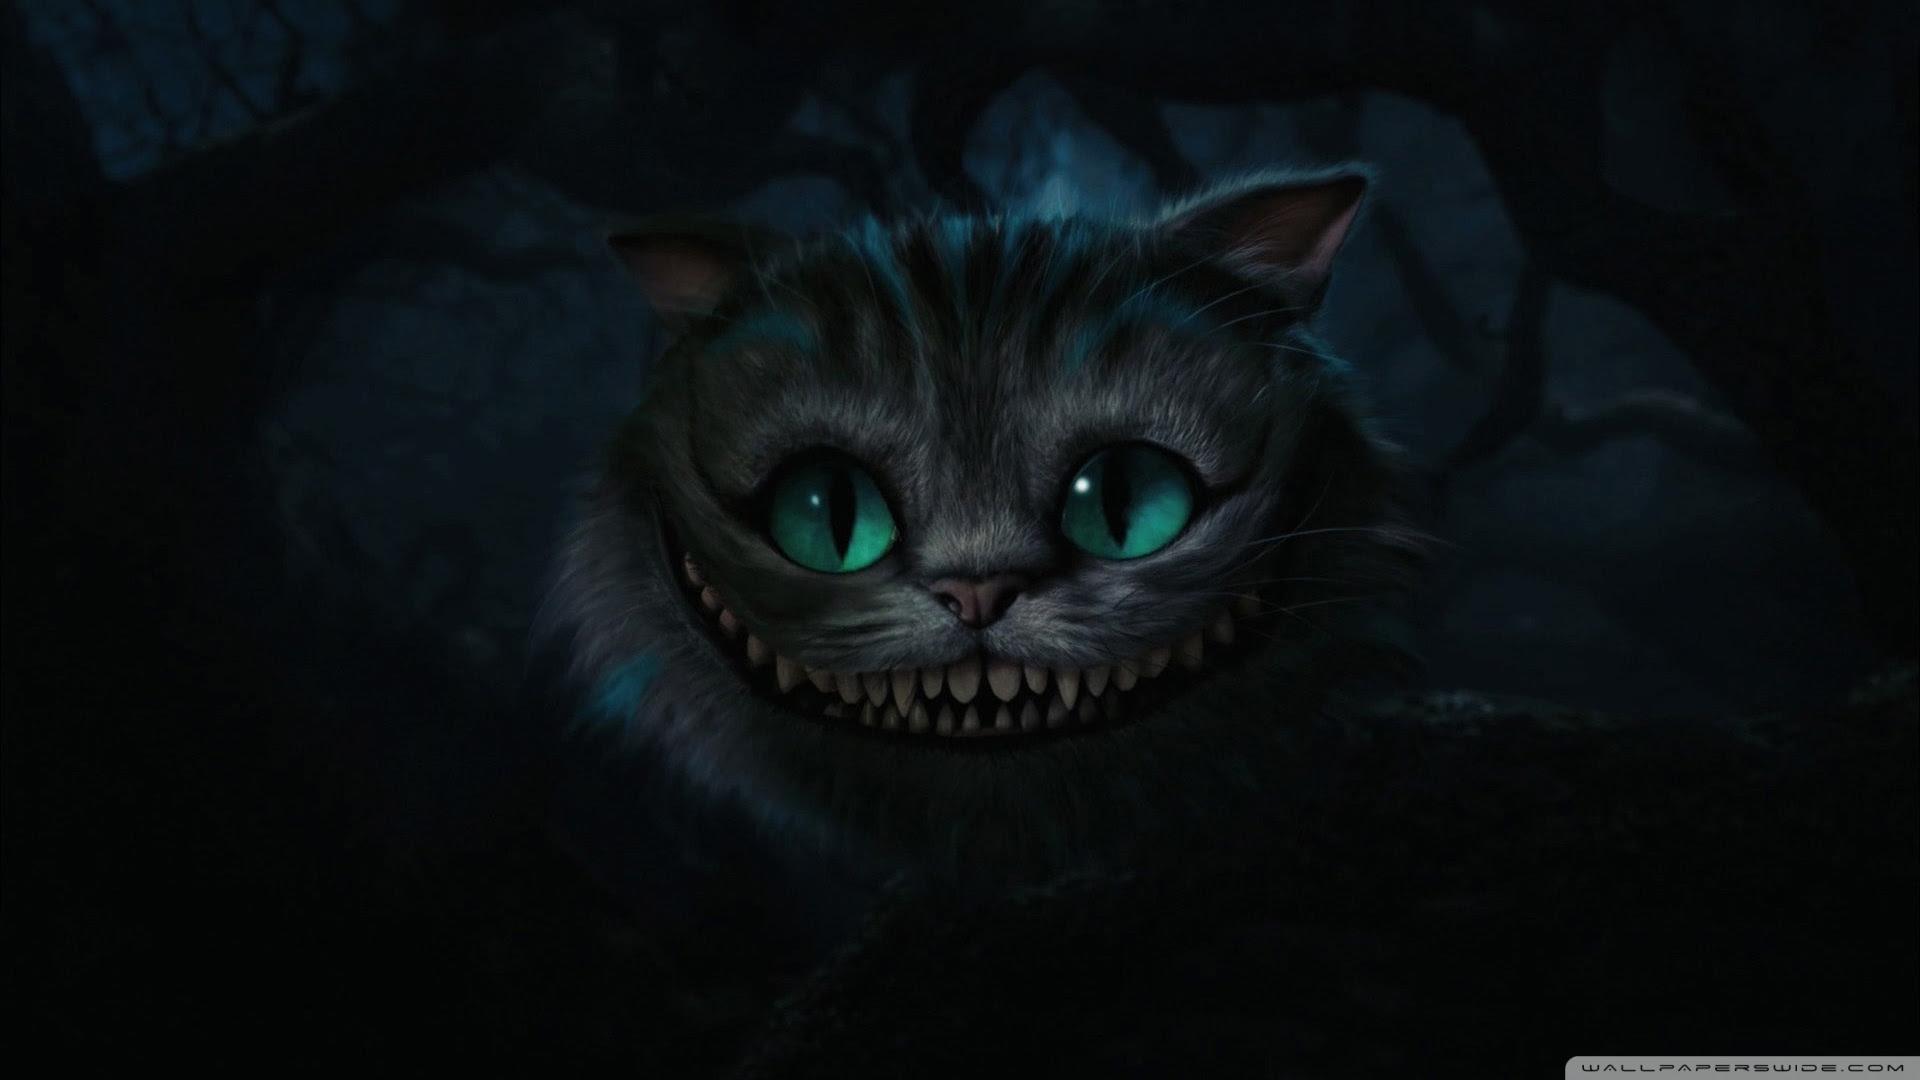 Cheshire Cat Alice In Wonderland Uhd Desktop Wallpaper For